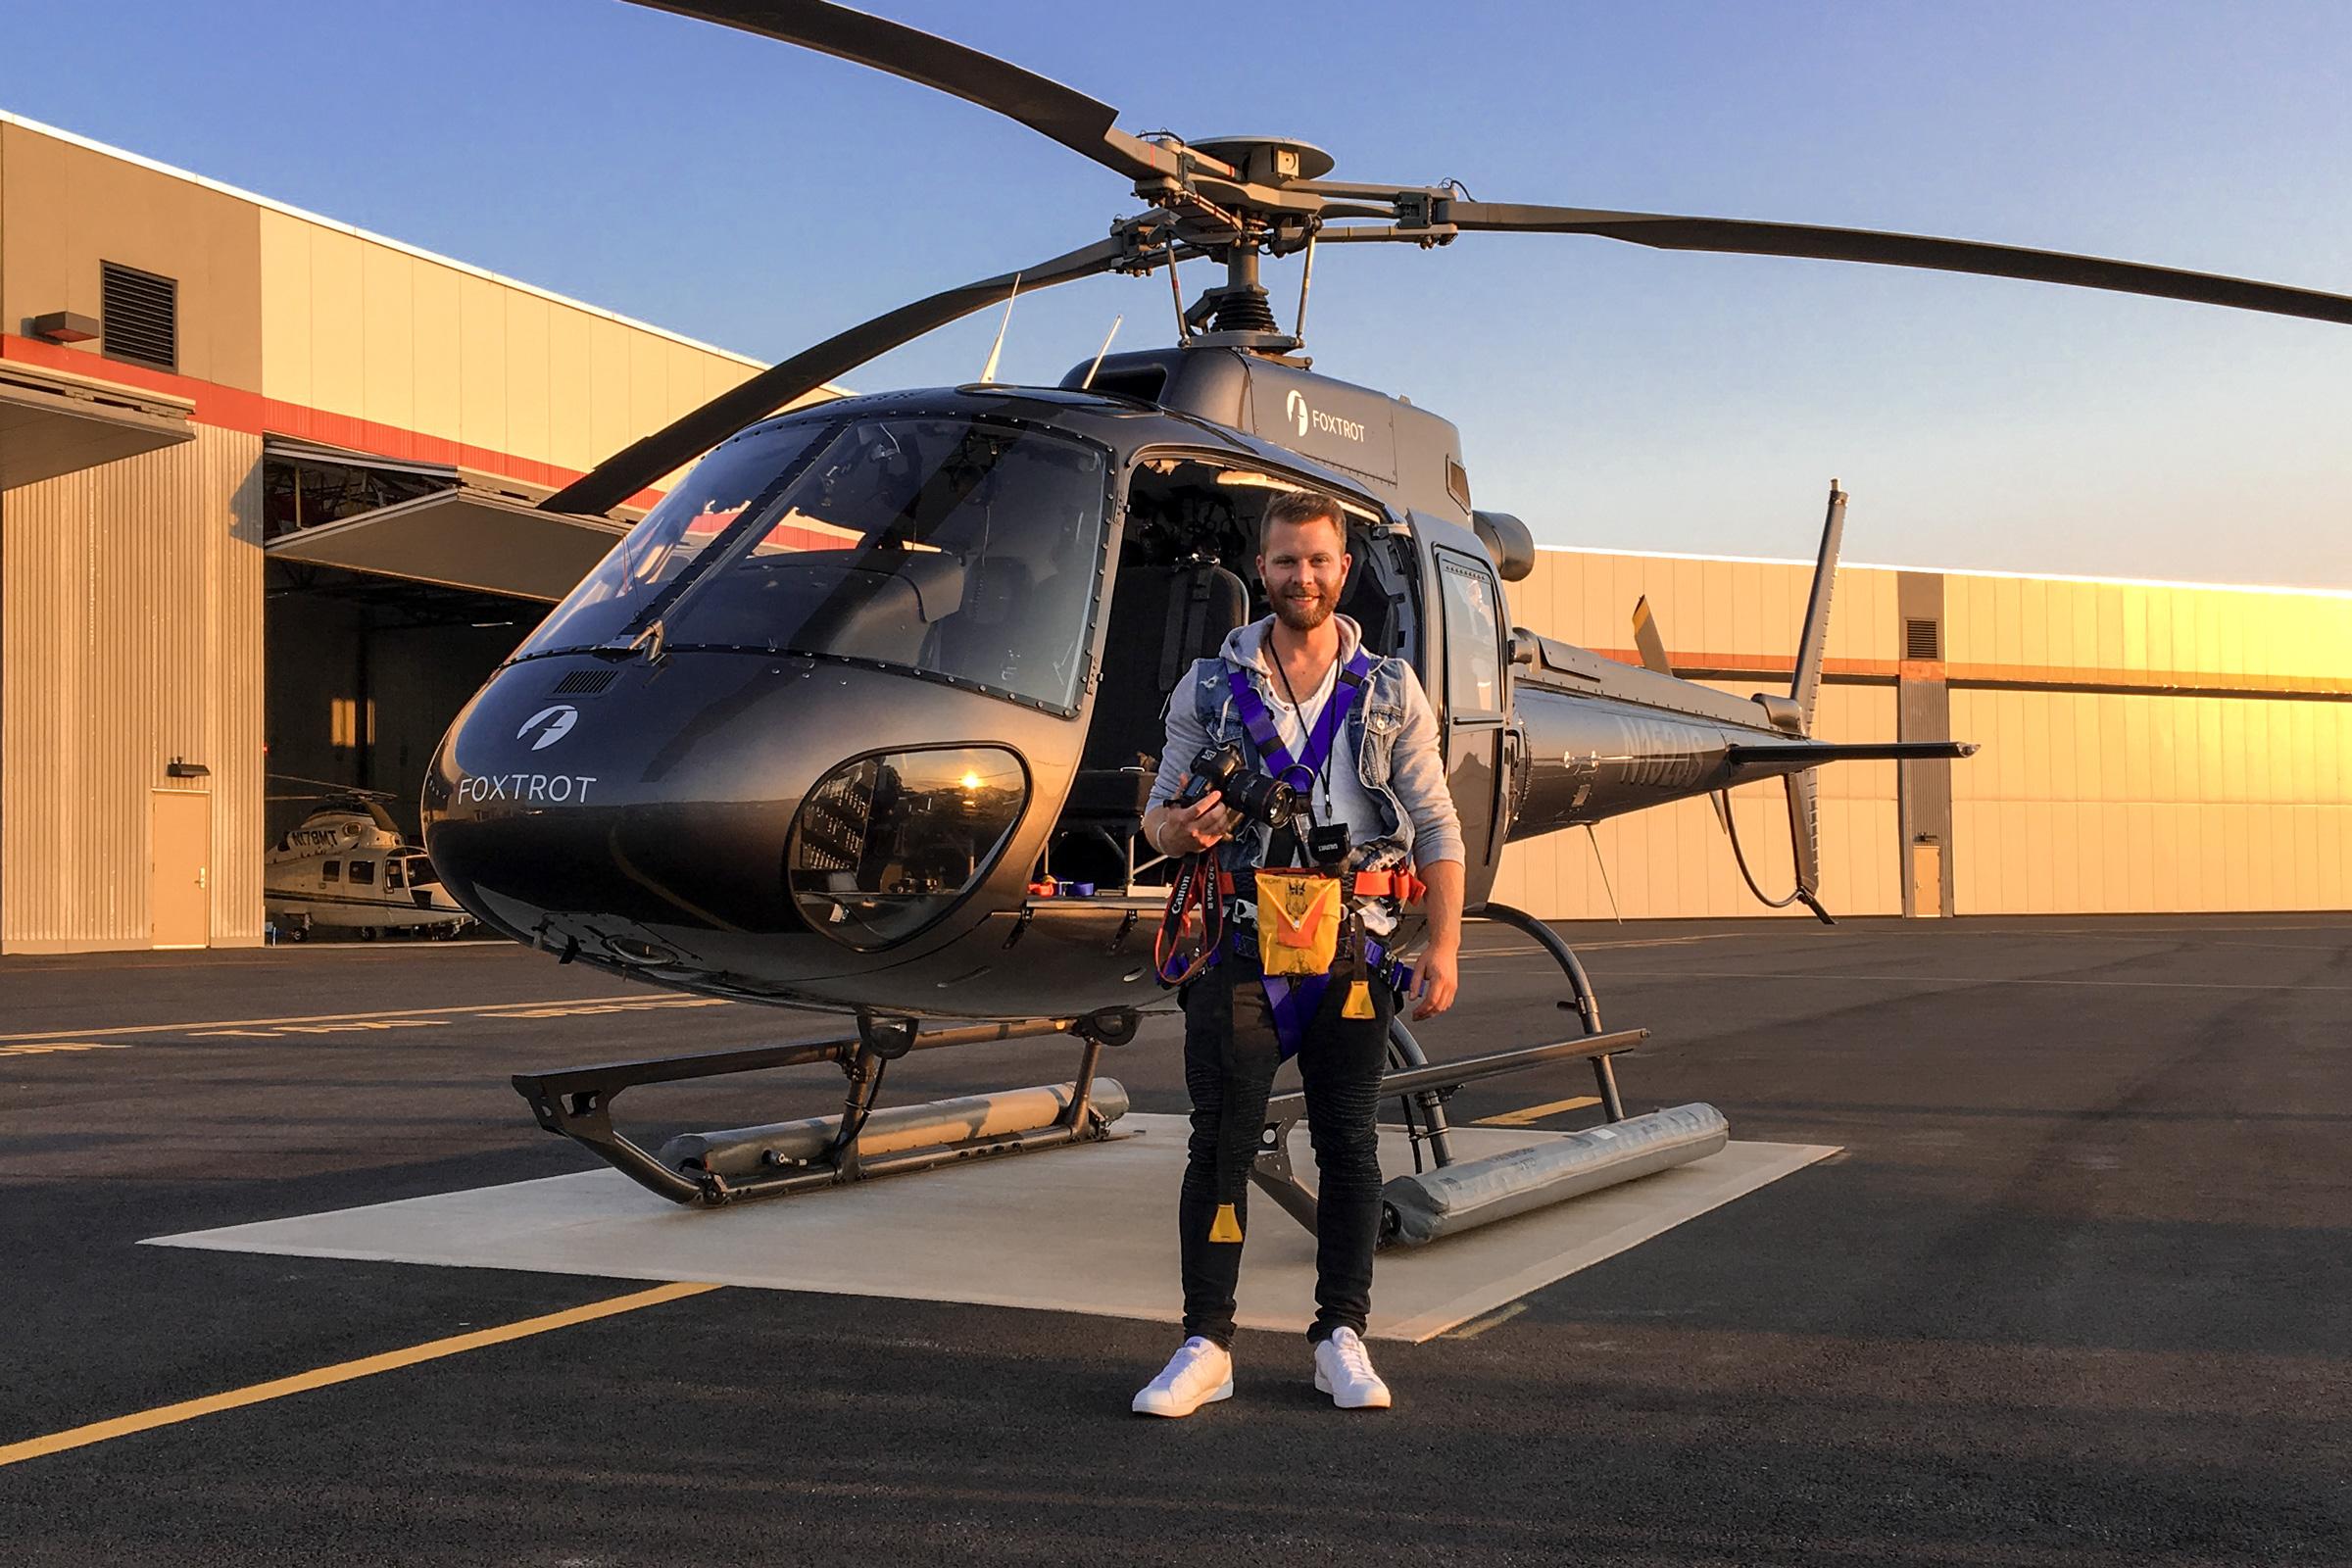 Portrait vom Fotografen Stephan Schmick vor einem Hubschrauber. Portrait of the photographer Stephan Schmick in front of a helicopter.